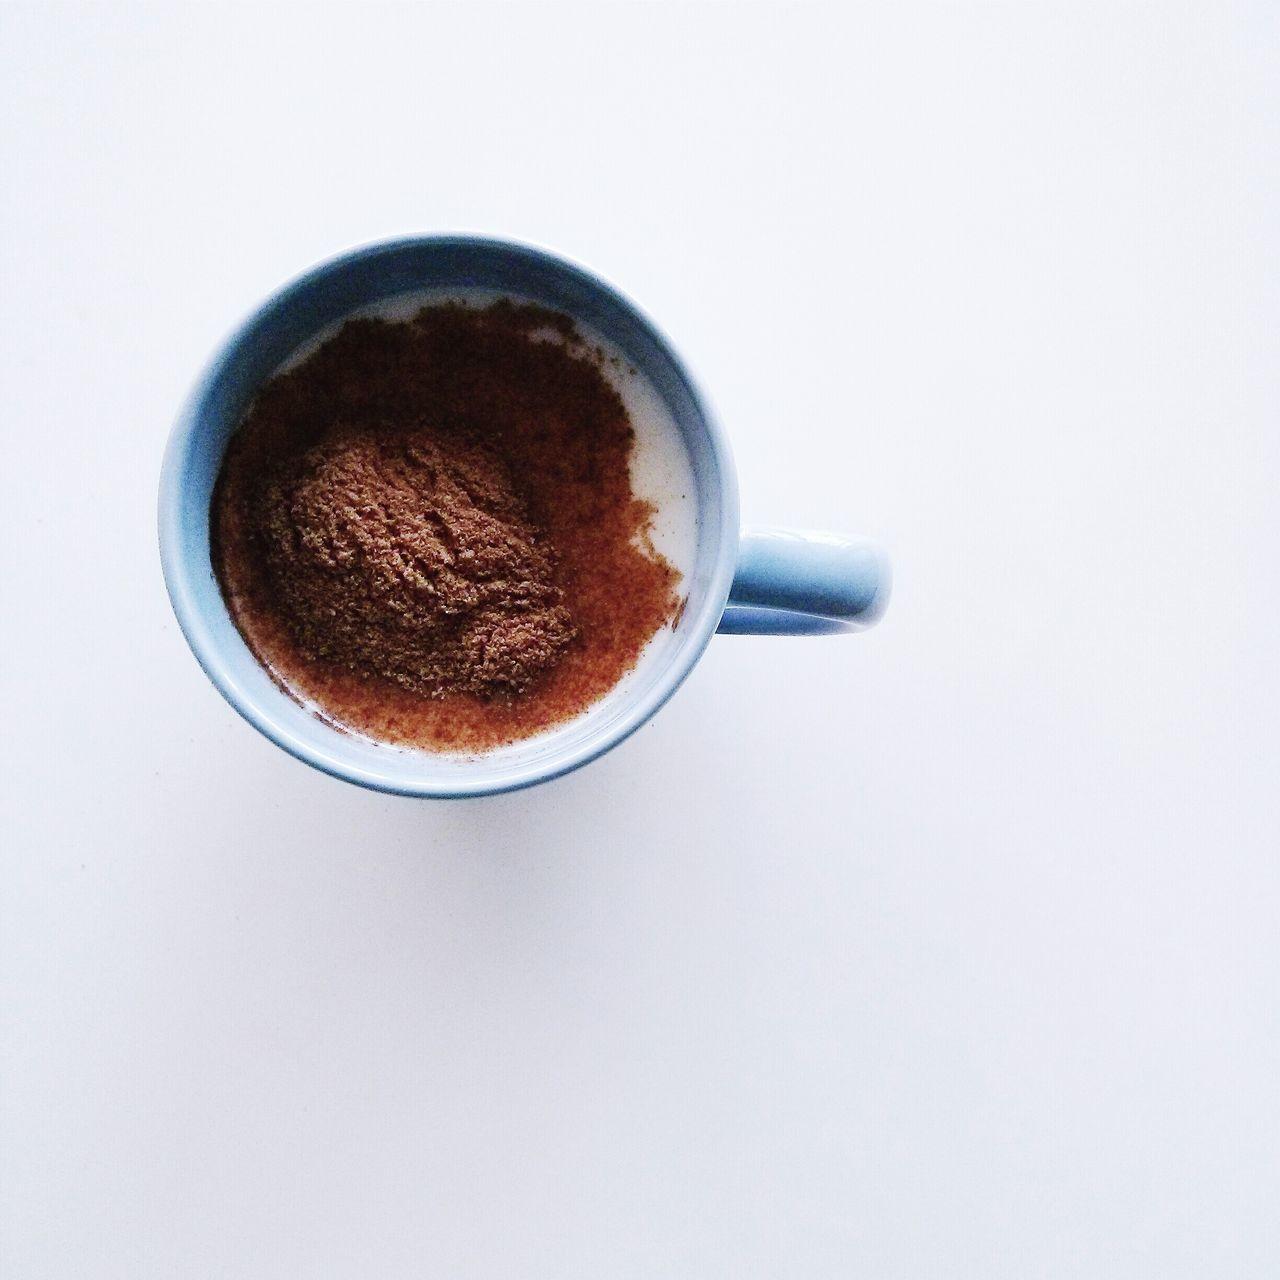 Stir things up. Happy Weekend! VSCO Minimalobsession Minimalism Hotchocolate